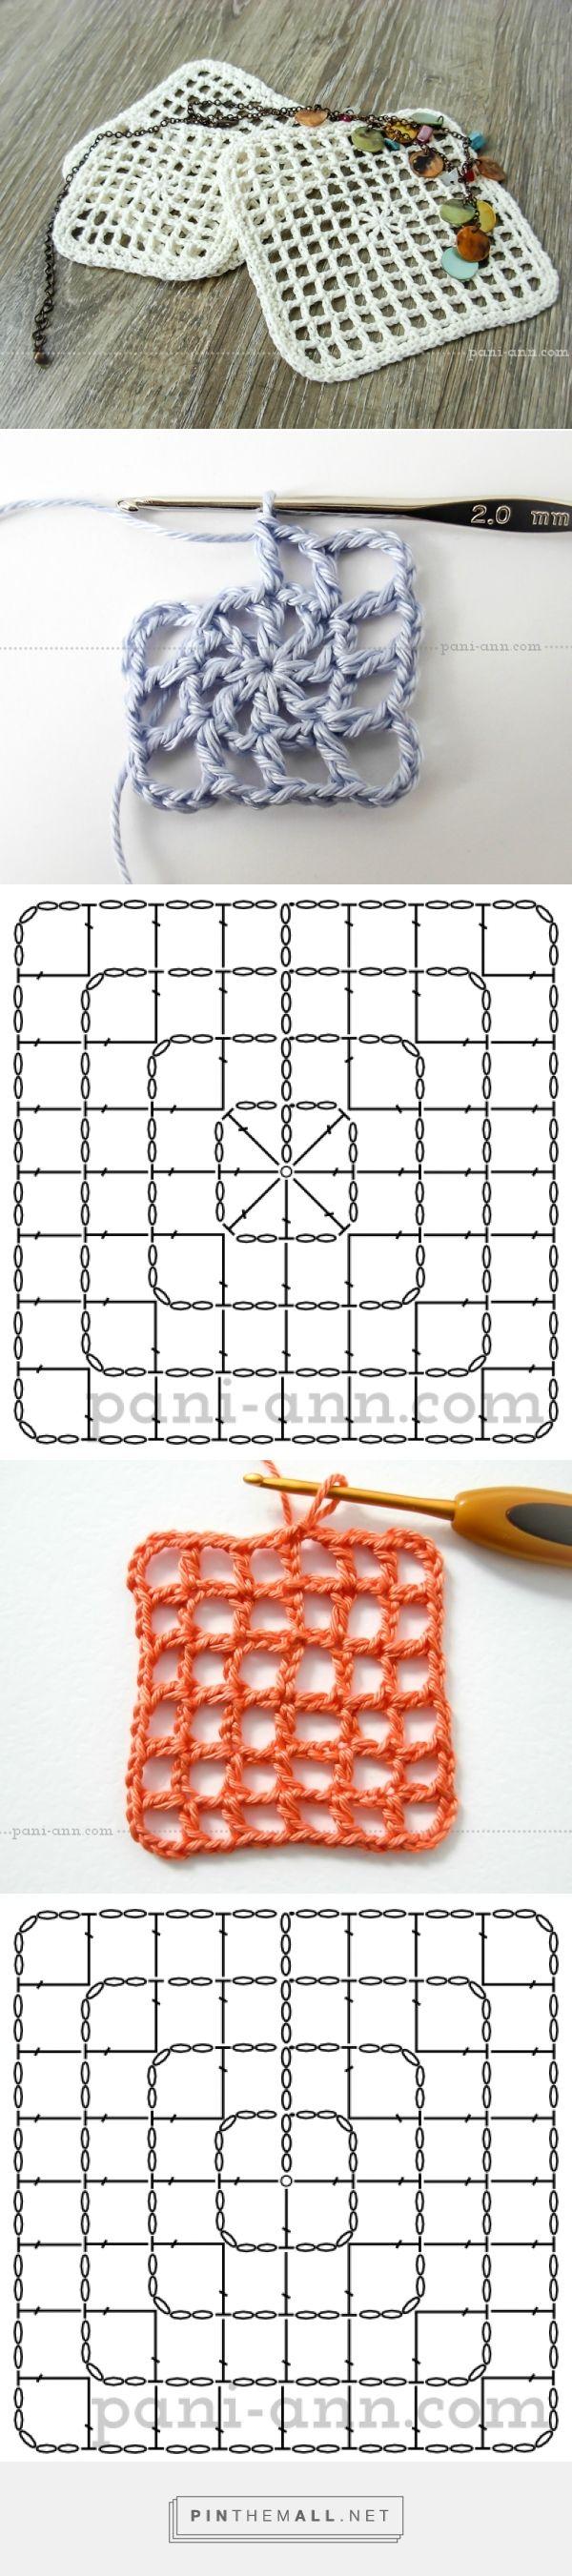 Kissenbezug häkeln Rückseite - big granny crochet - filet crochet in ...